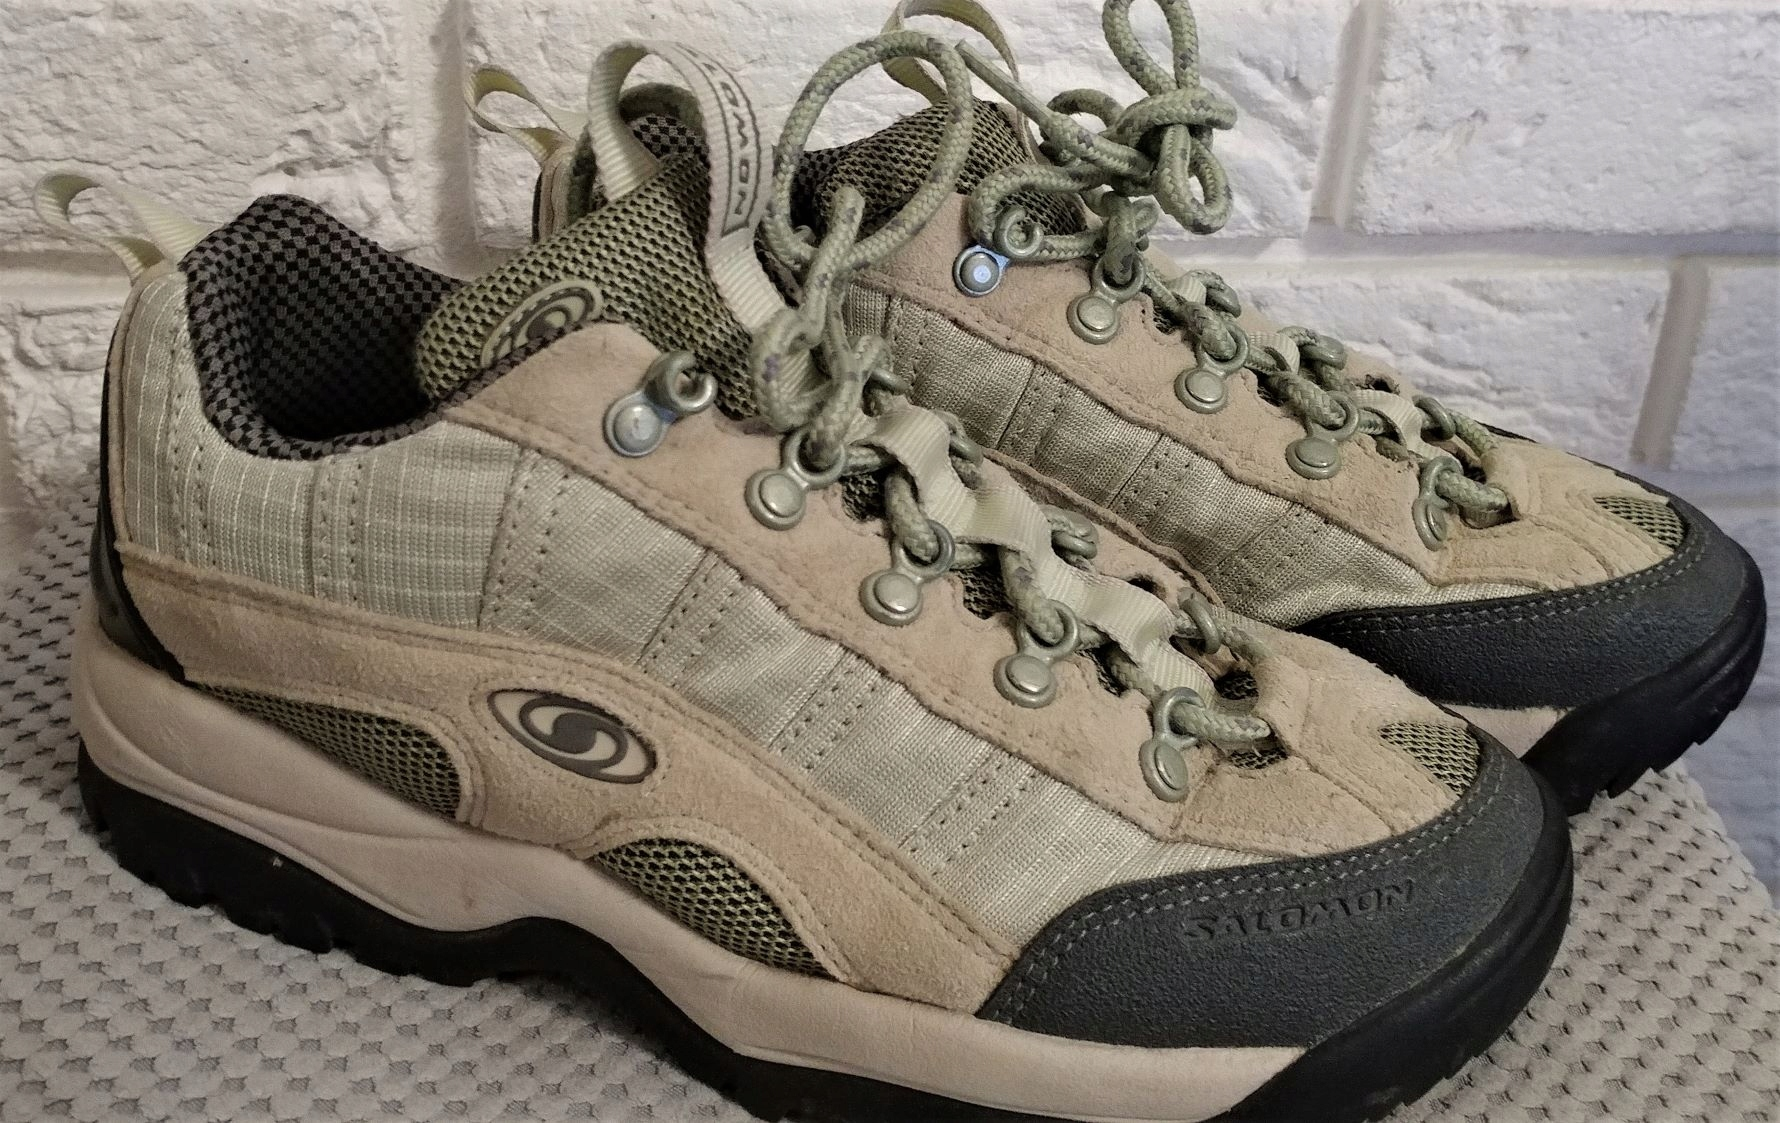 SALOMON buty sportowe trekkingowe 37 2/3